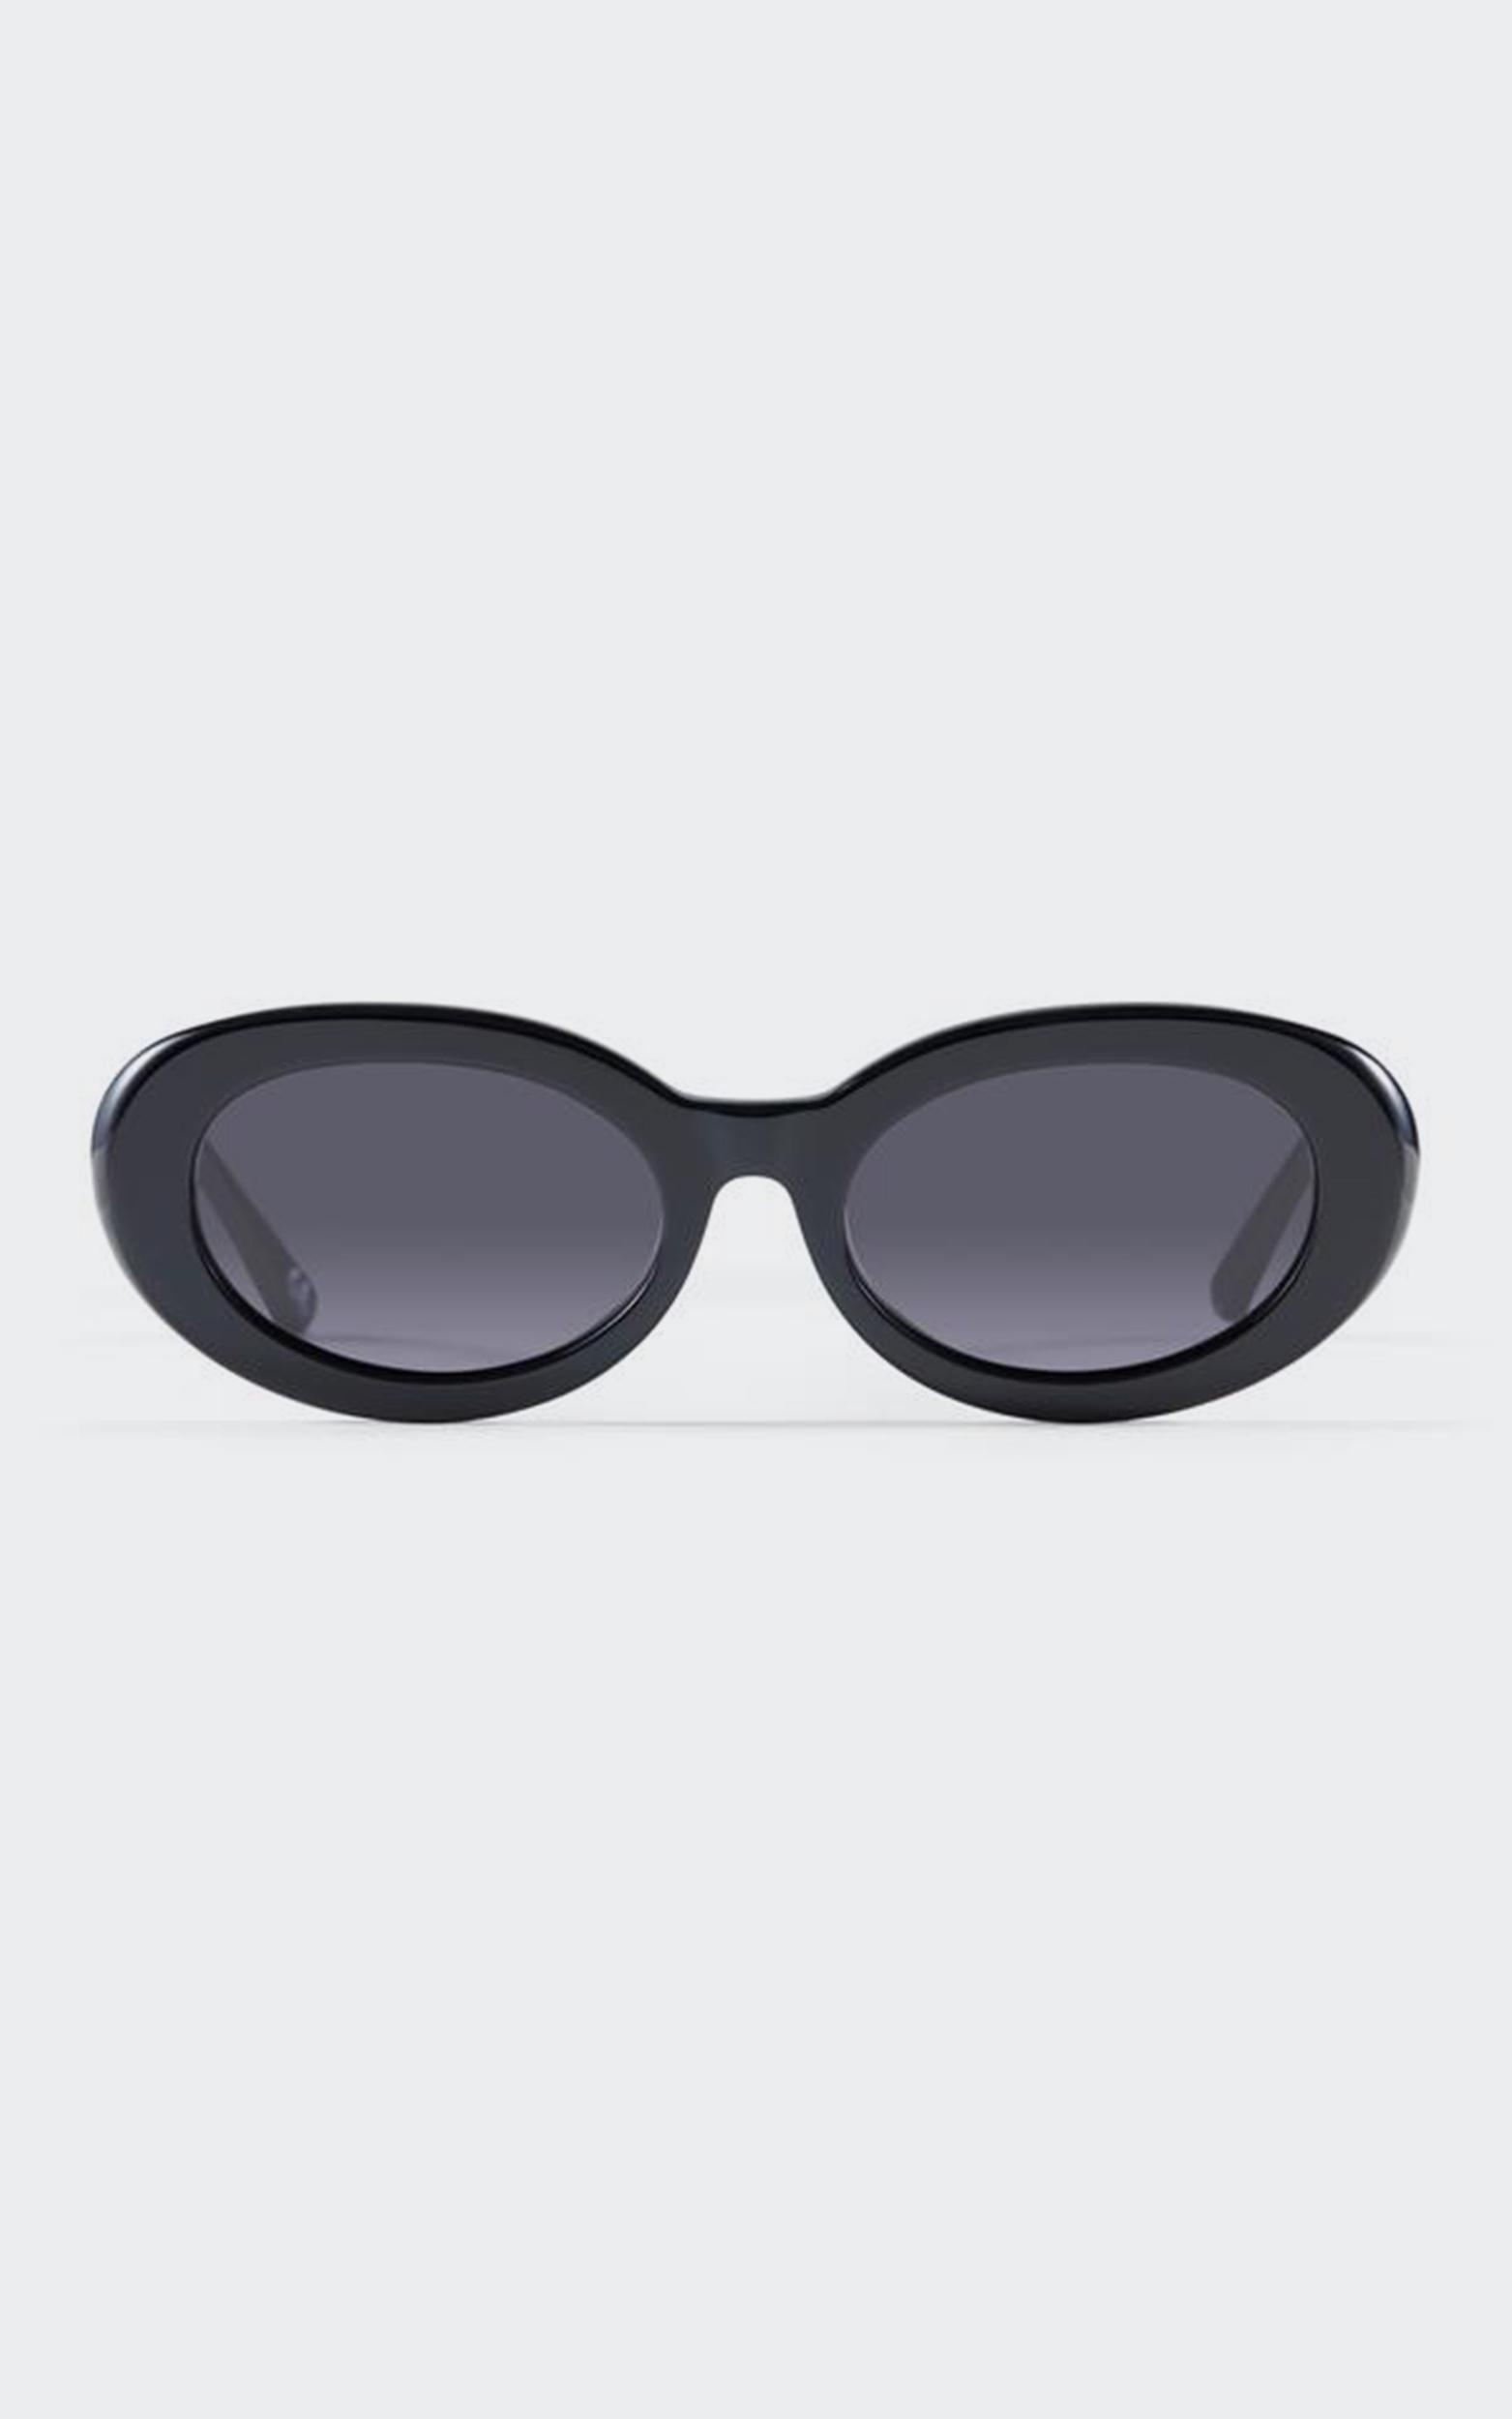 Luv Lou - The Estelle Sunglasses in Jet Black, Black, hi-res image number null